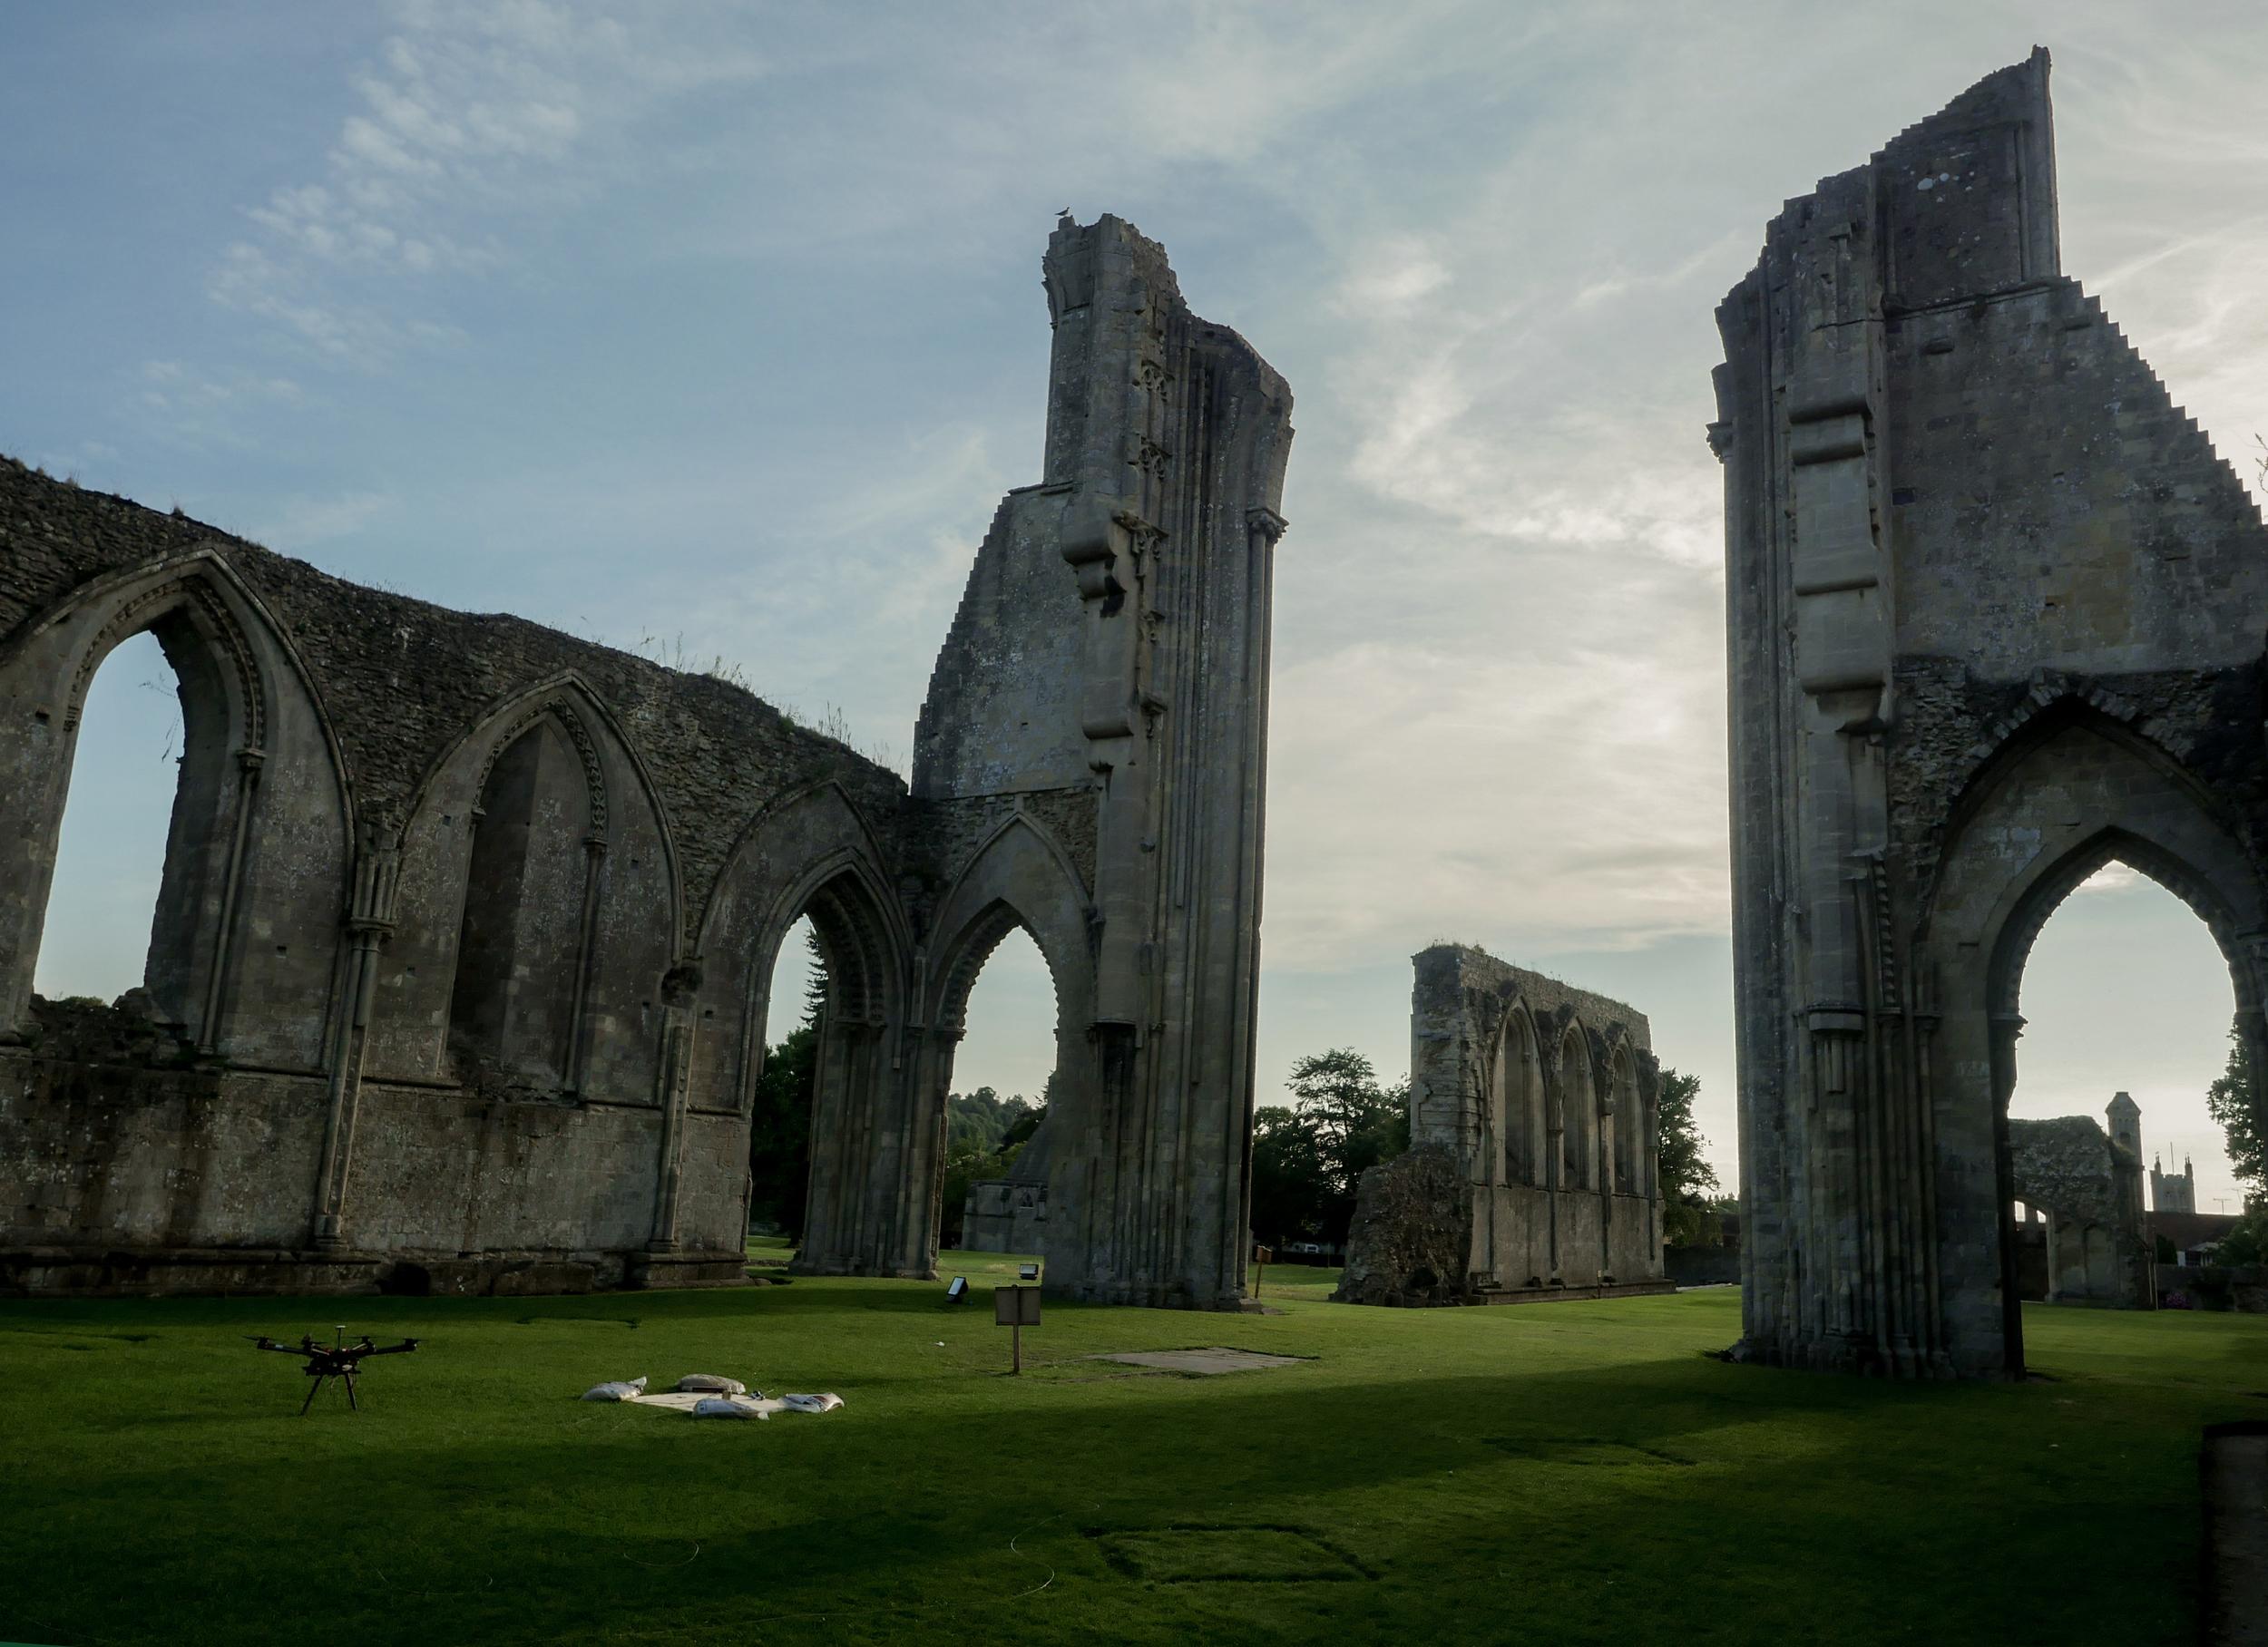 Glasonbury Abbey